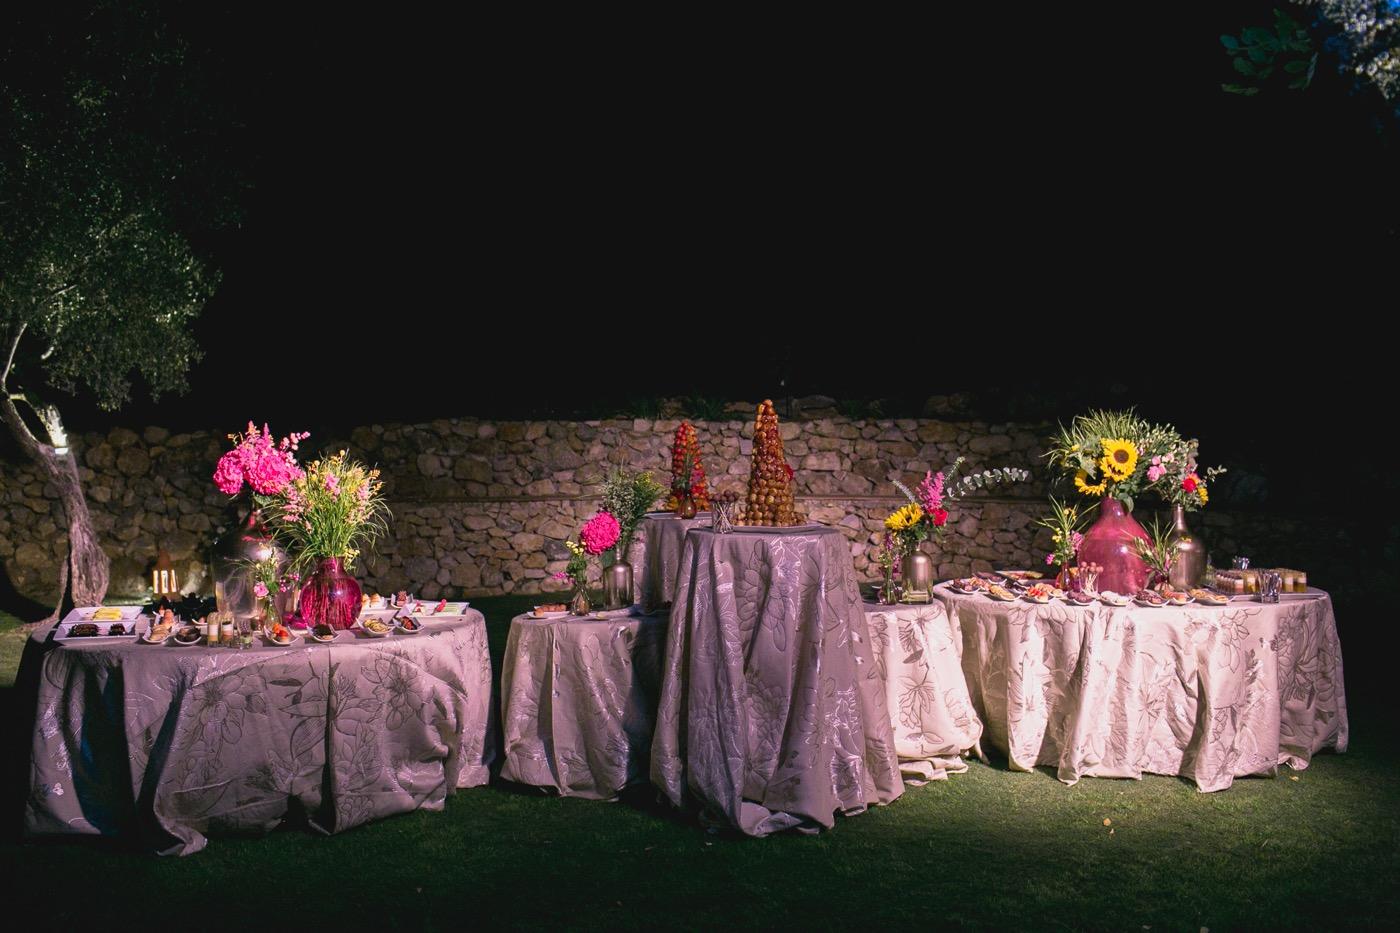 Si-Quiero-Wedding-Planner-By-Sira-Antequera-Bodas-Málaga-Marbella-Miami- PATRICIA-JUANLU-6